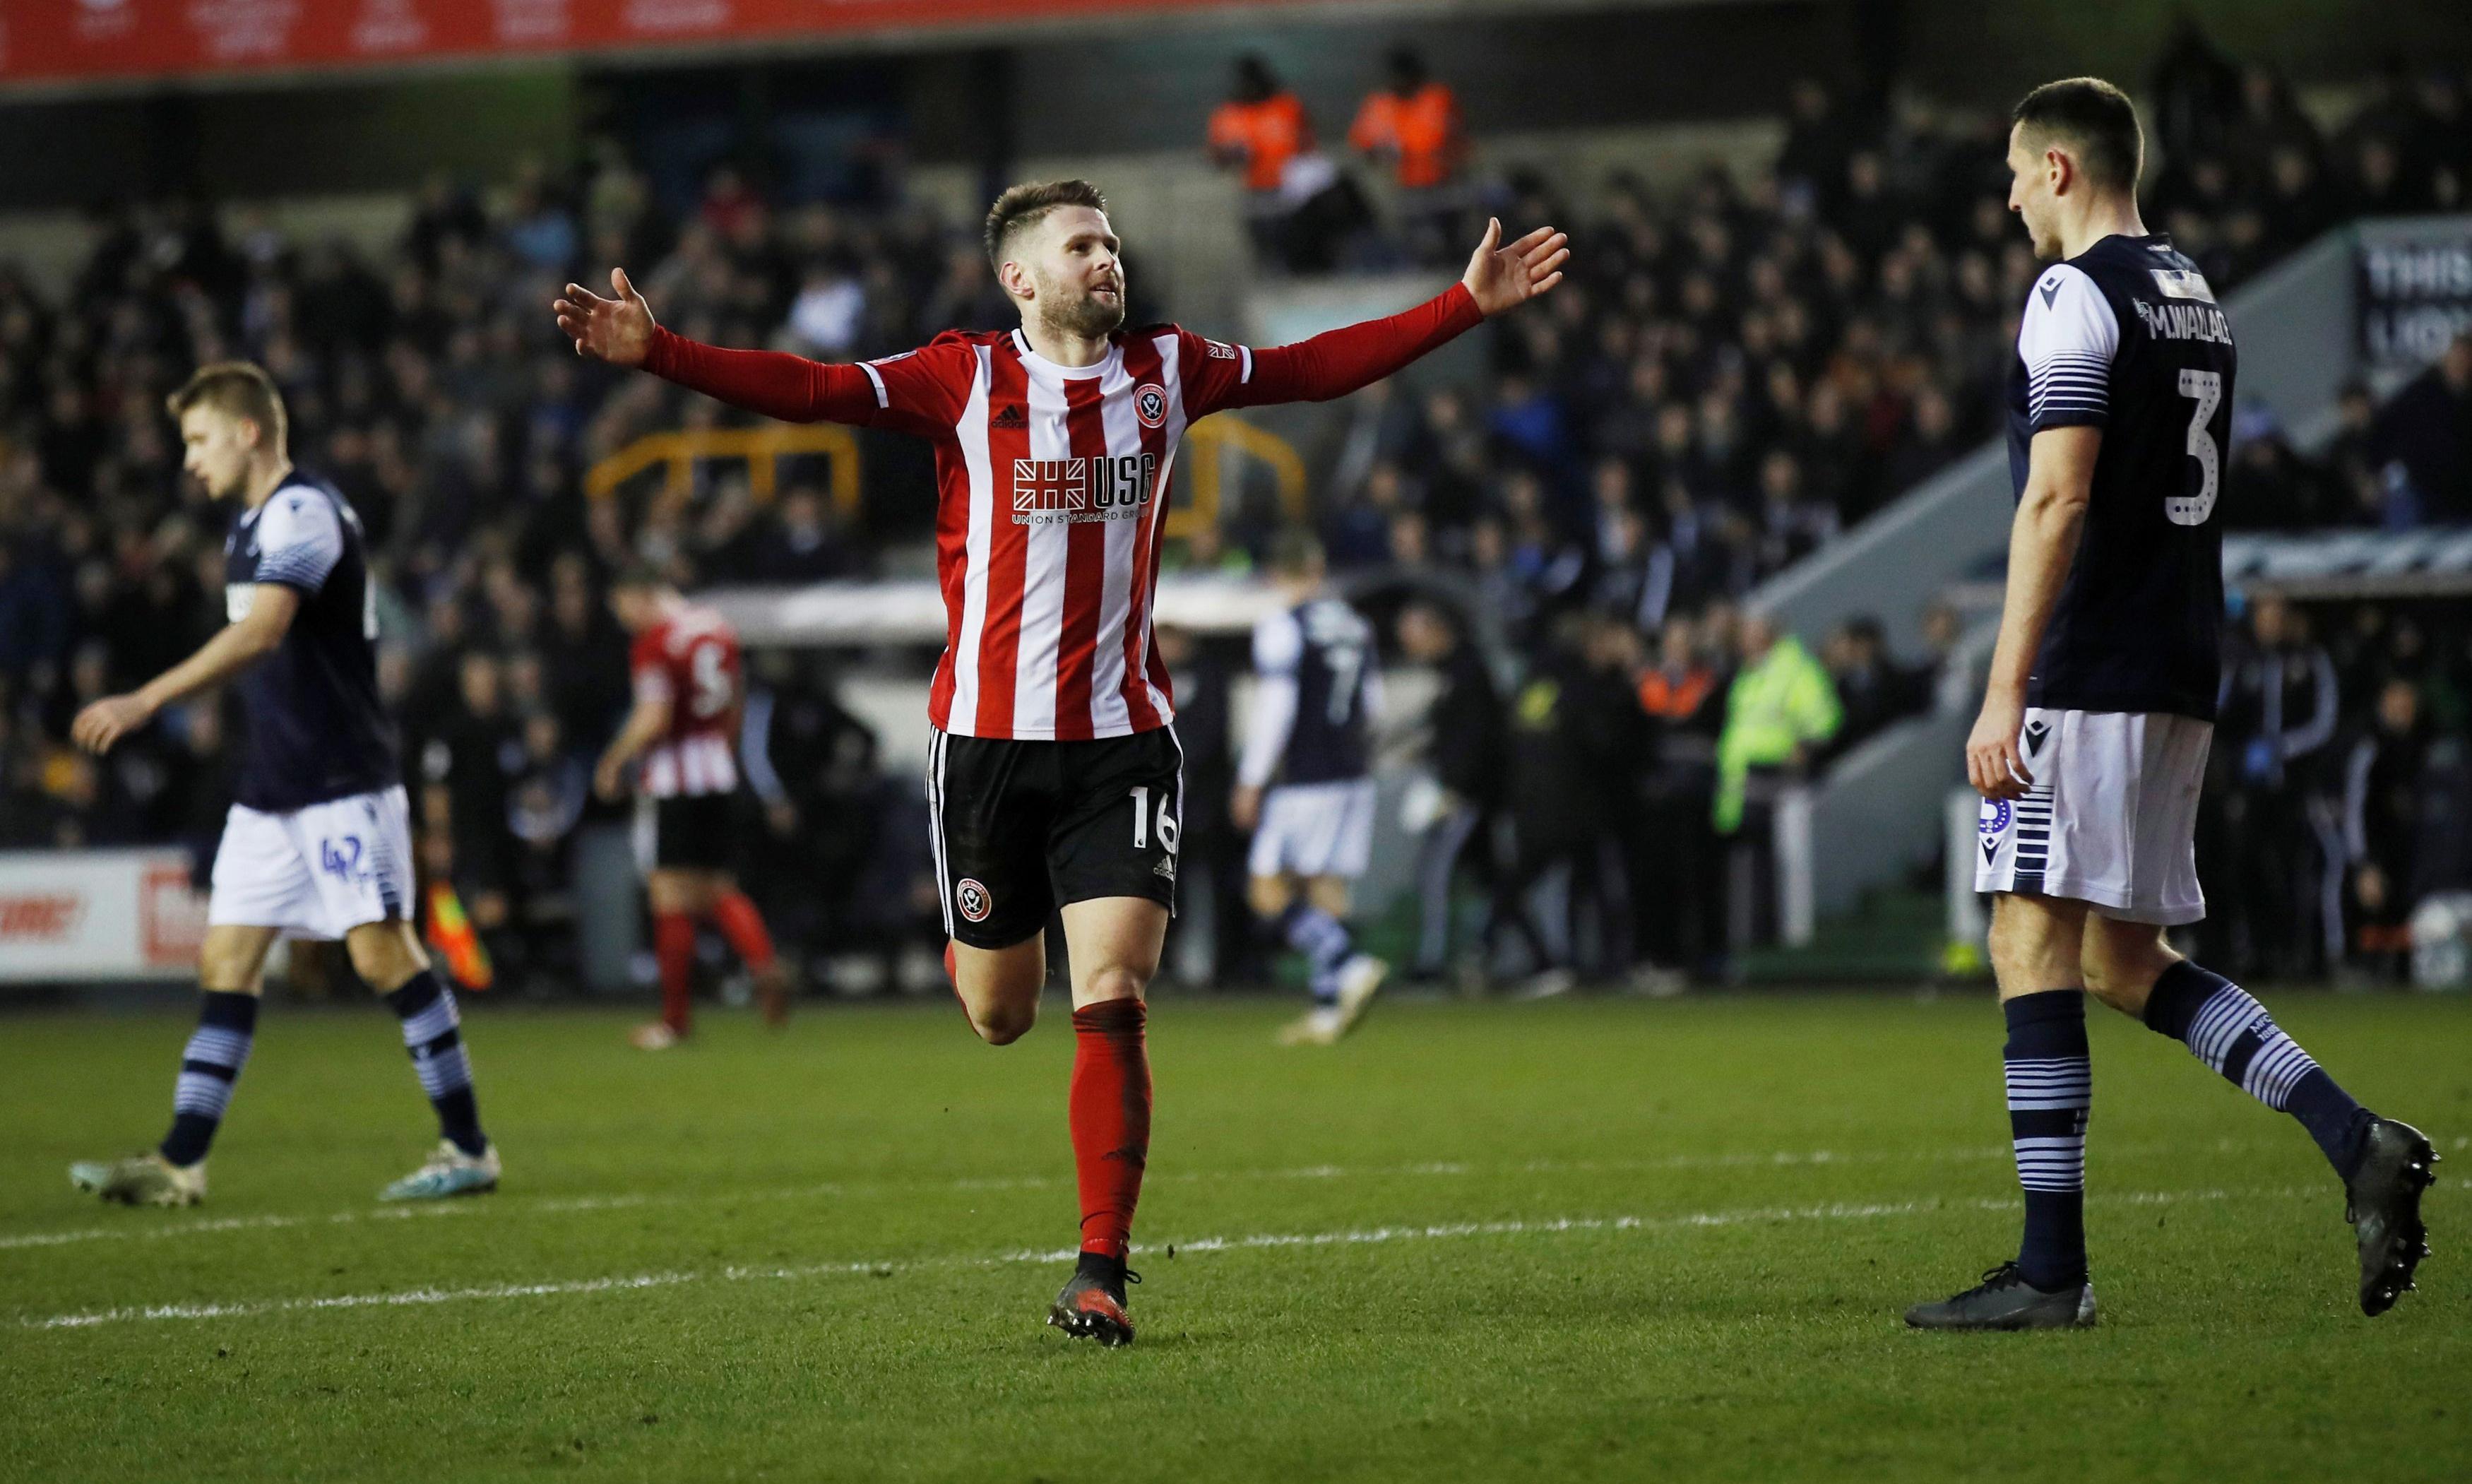 Muhamed Besic and Ollie Norwood help Sheffield United avoid Millwall upset